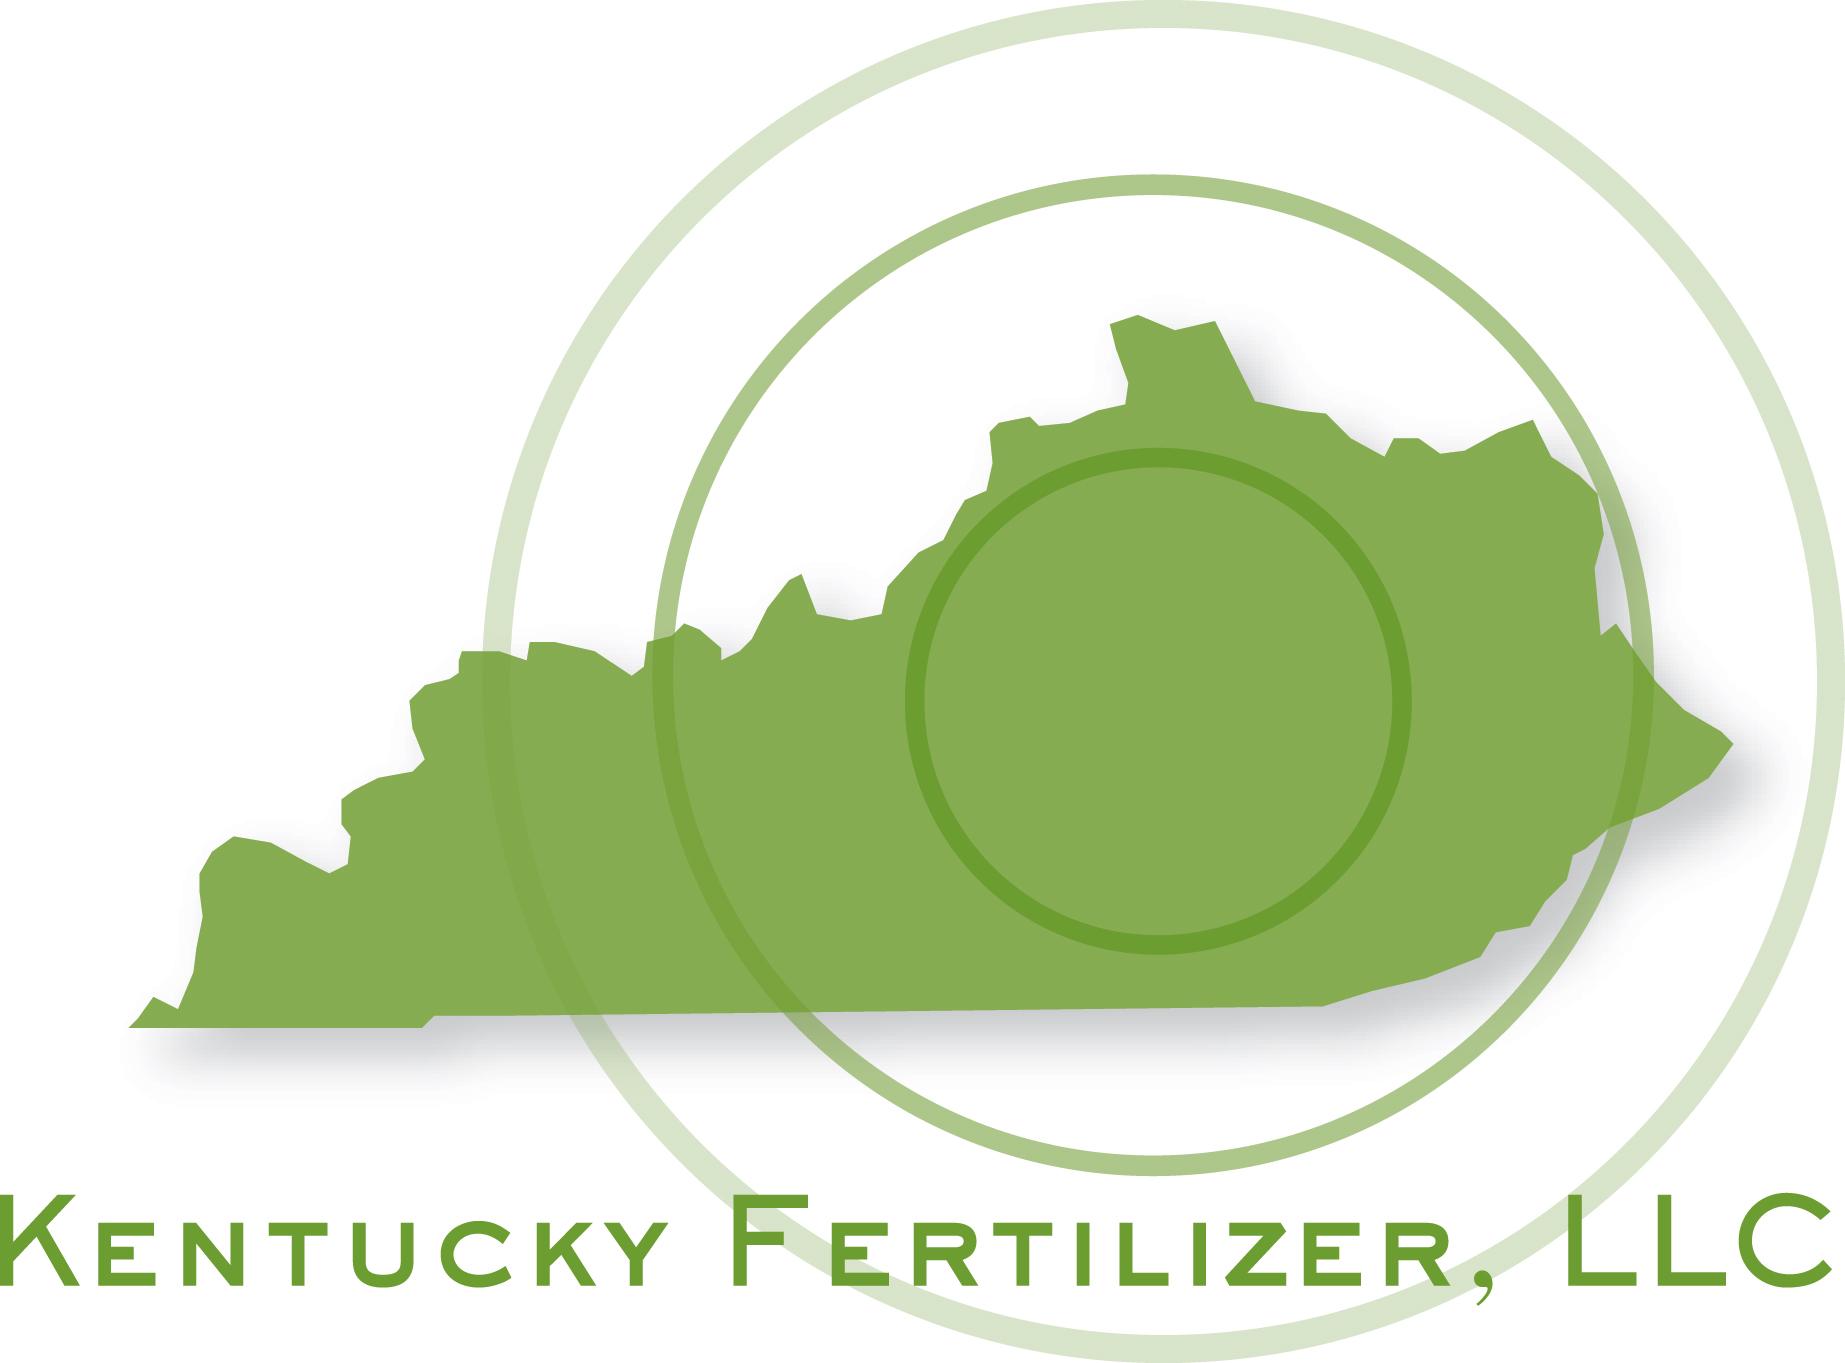 Ky Fertilizer.jpg